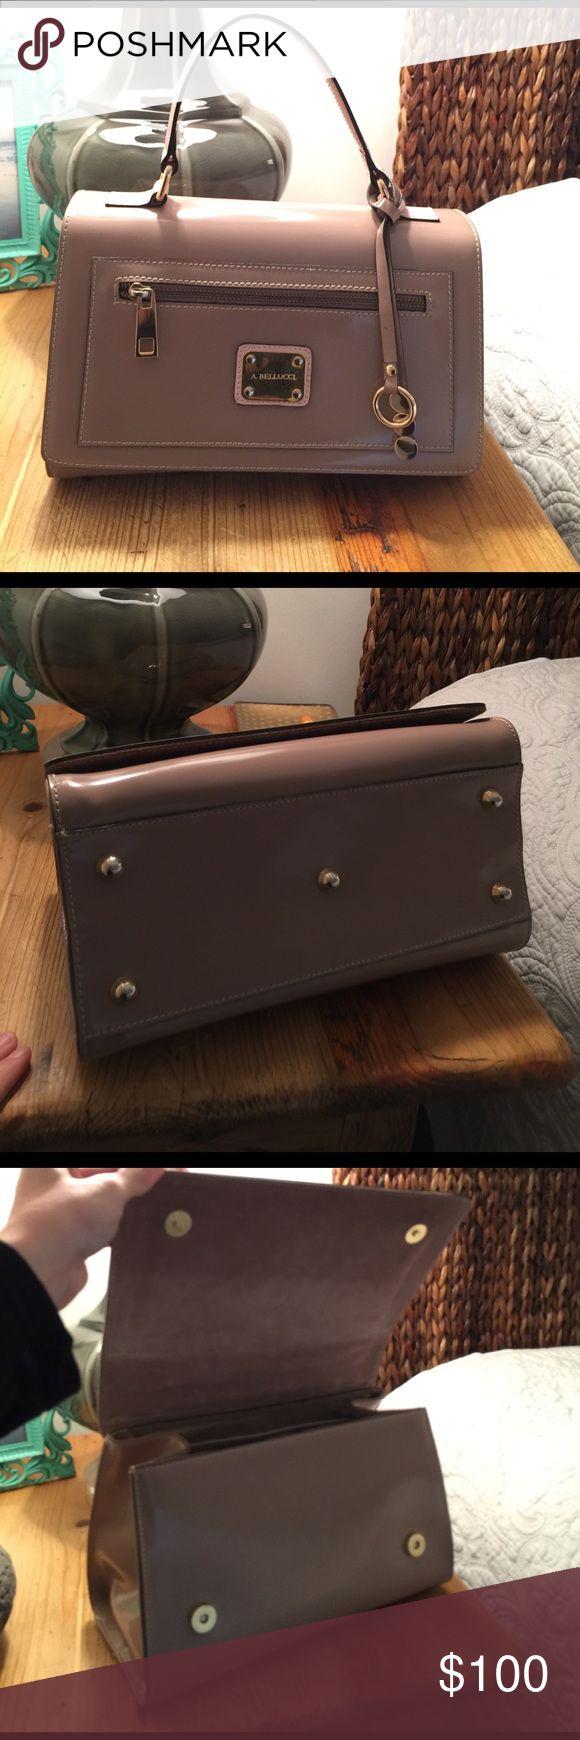 Alberto Bellucci Italian leather handbag Alberto Bellucci Italian leather handbag in excellent condition. Like new! Feel free to make an offer :) alberto bellucci Bags Satchels